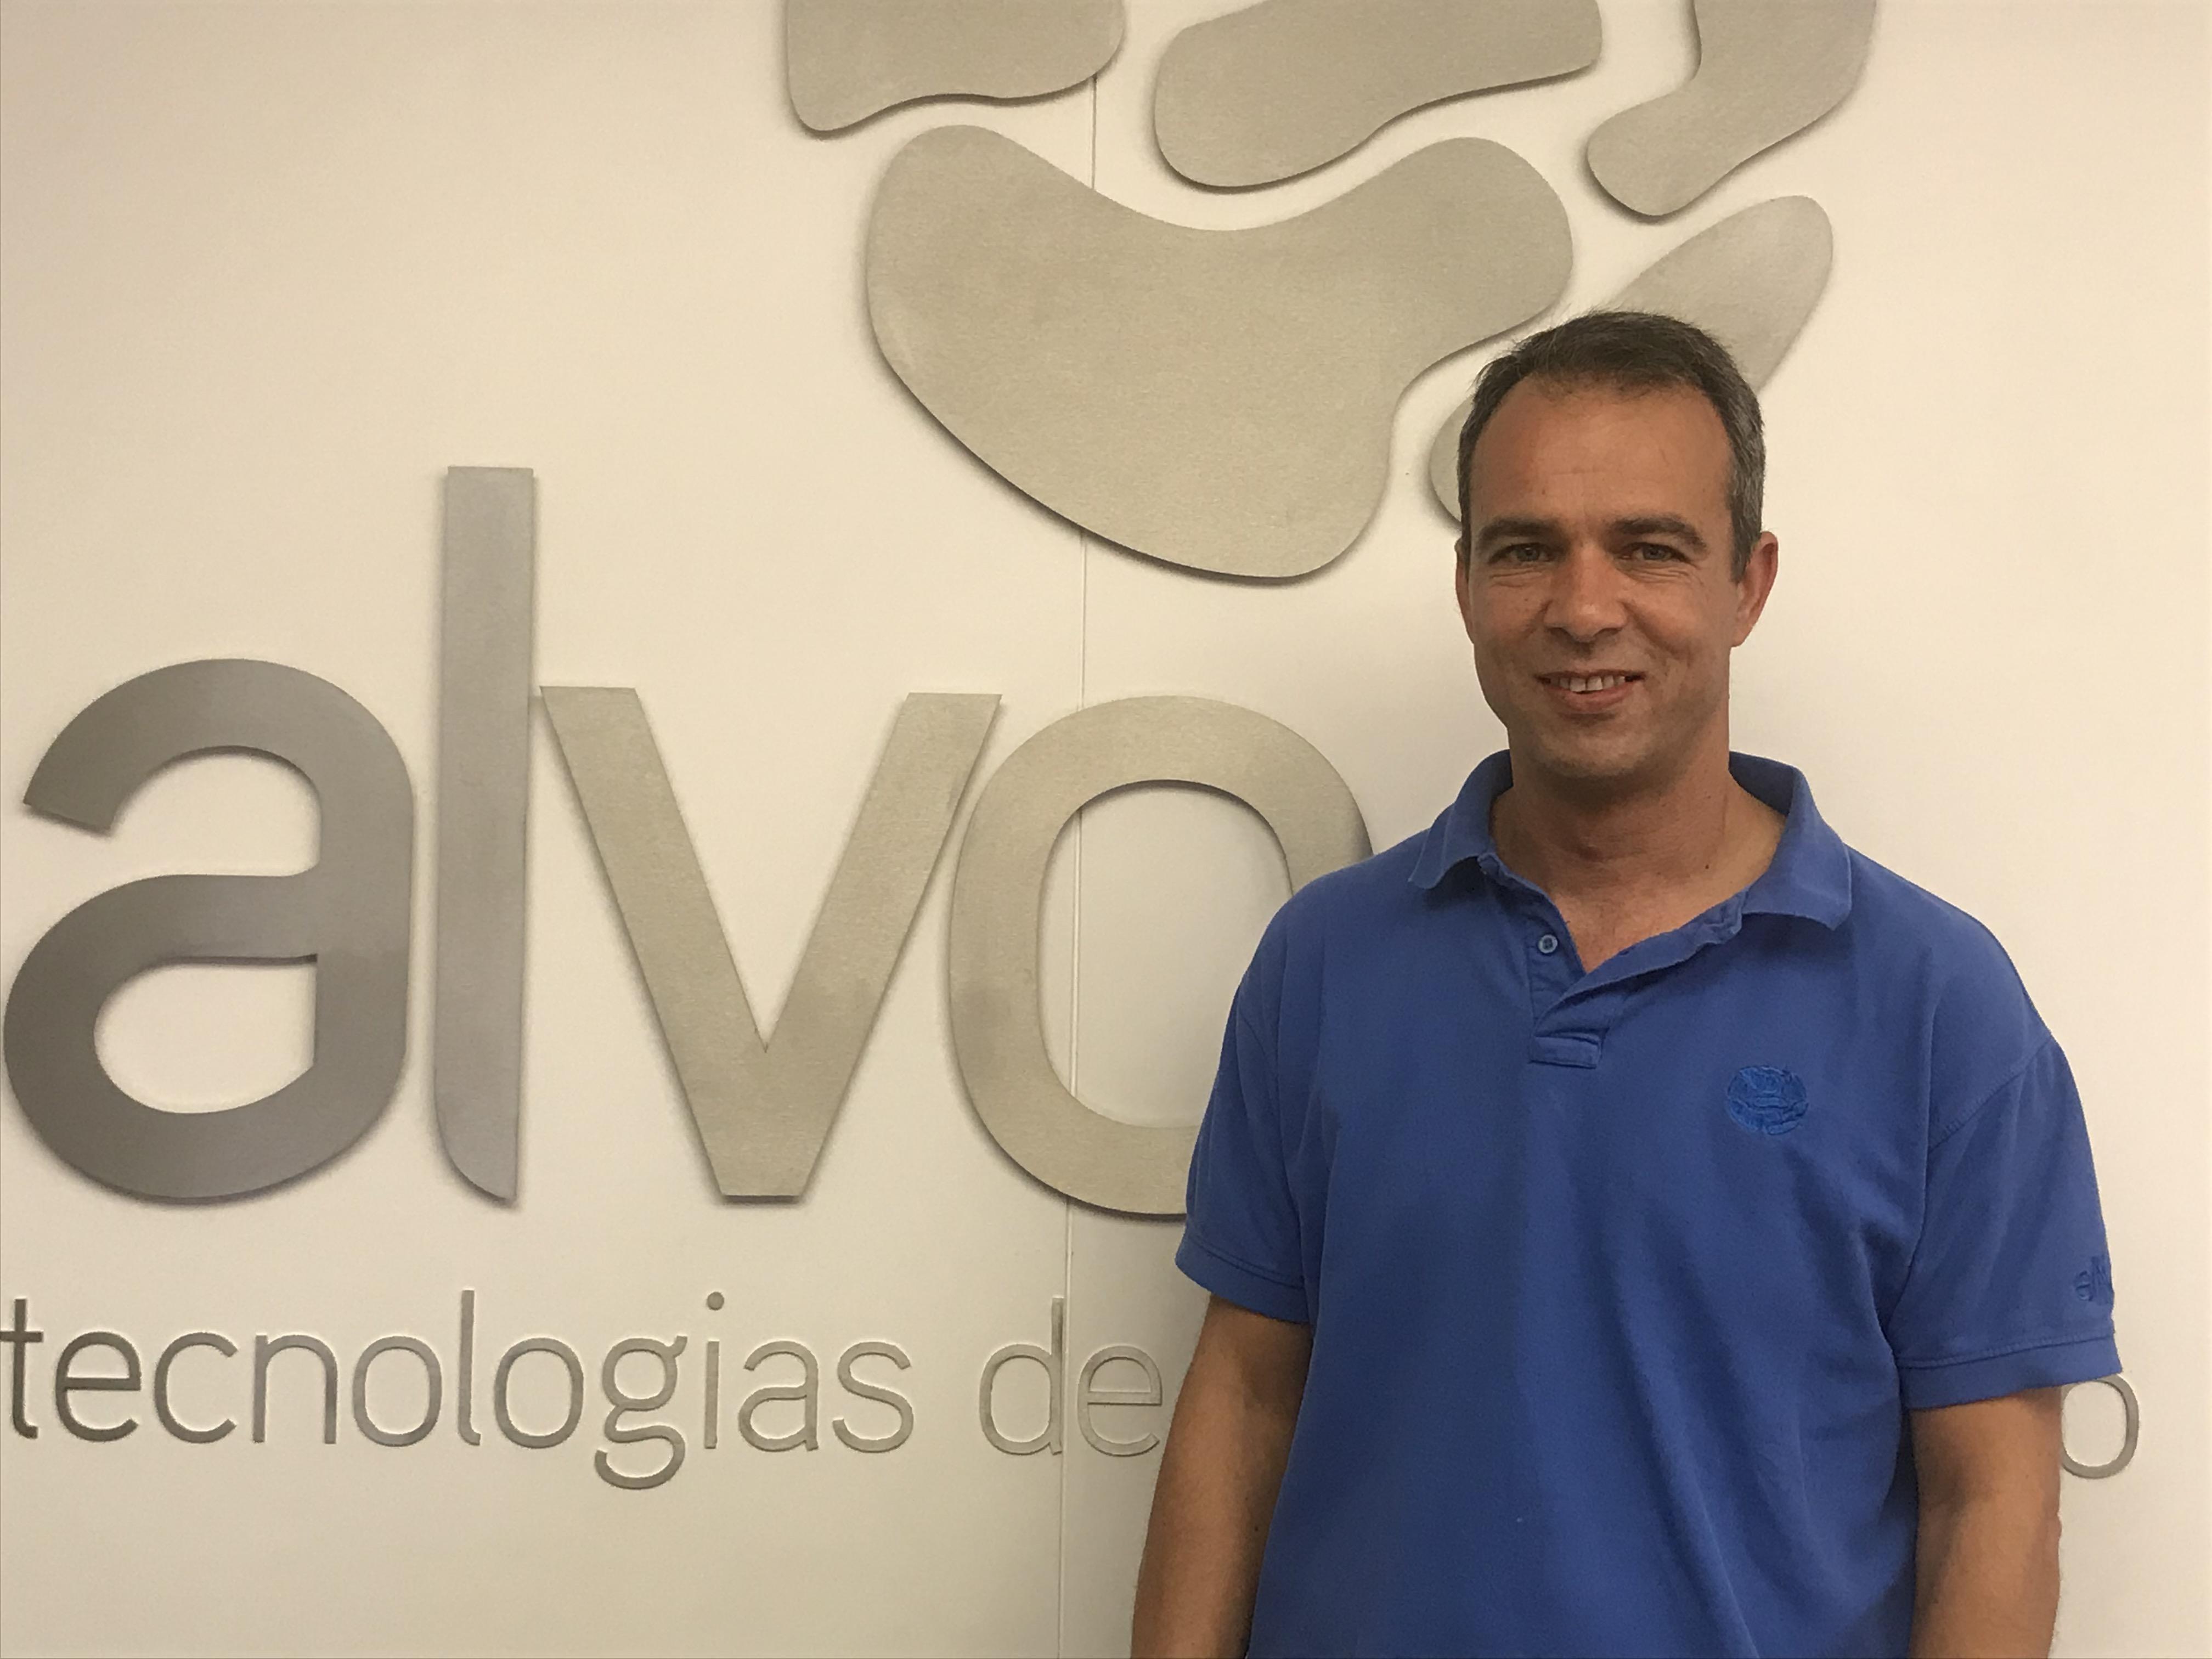 Rui Freitas - Consultor e Developer Alvo